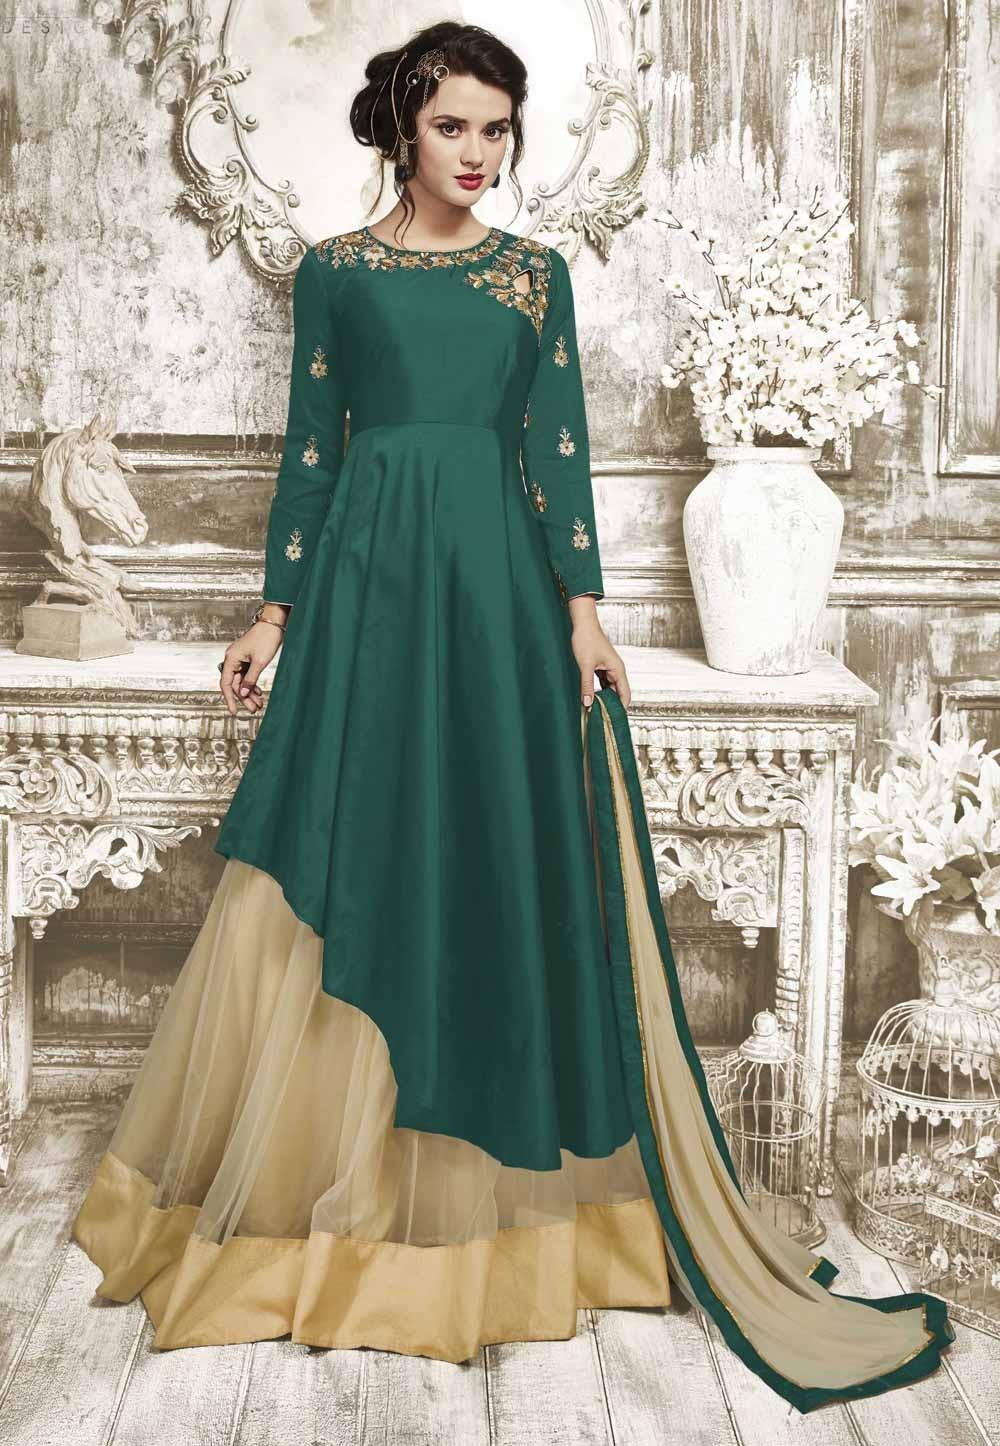 Anarkali Style Wonderful Salwar Kameez in Green Color Silk Fabric